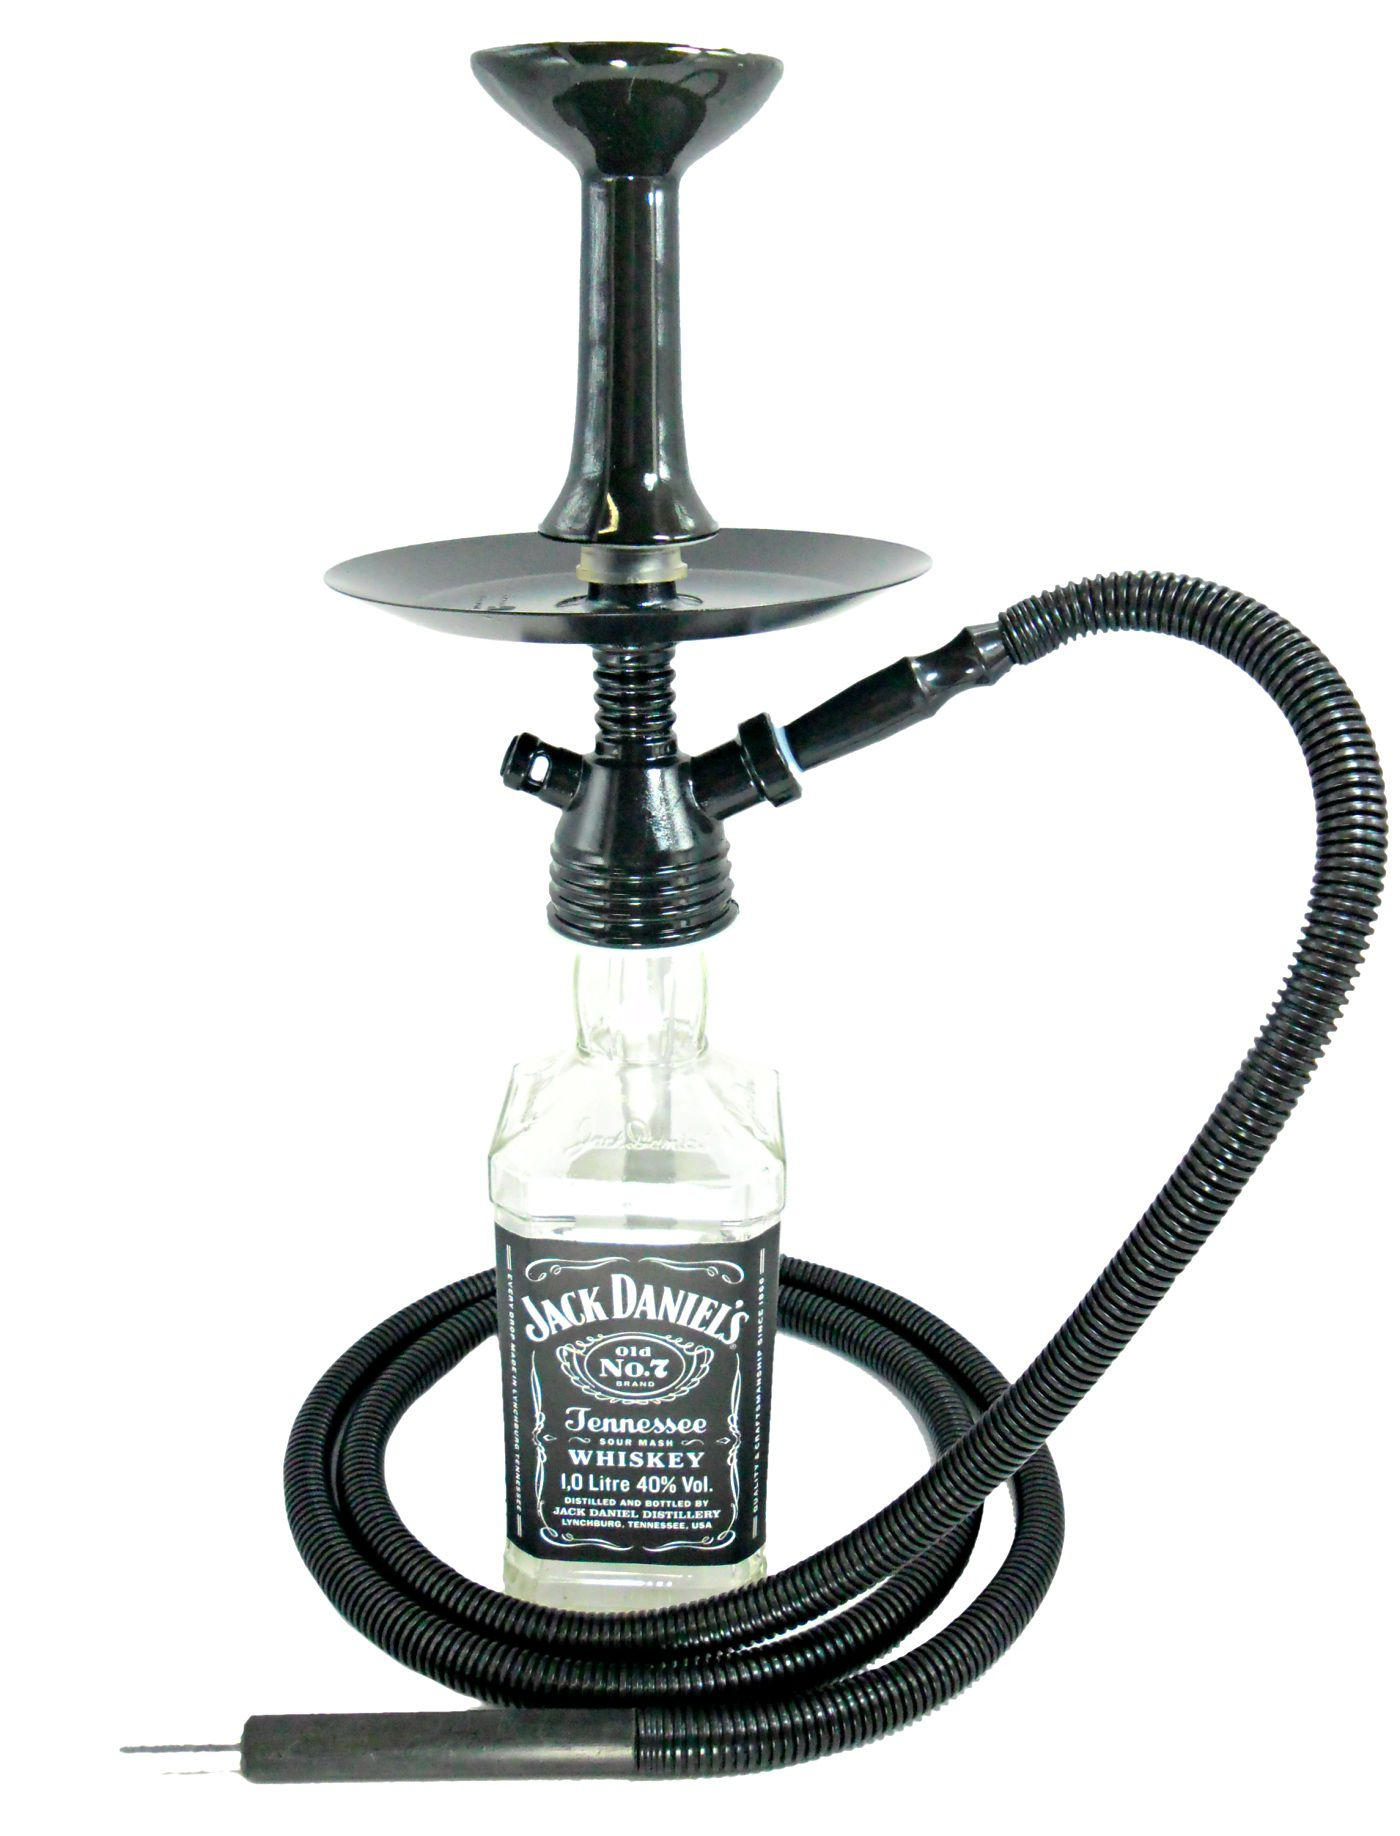 Narguile de garrafa completo FULGORE, com garrafa Jack Daniel's tradicional.